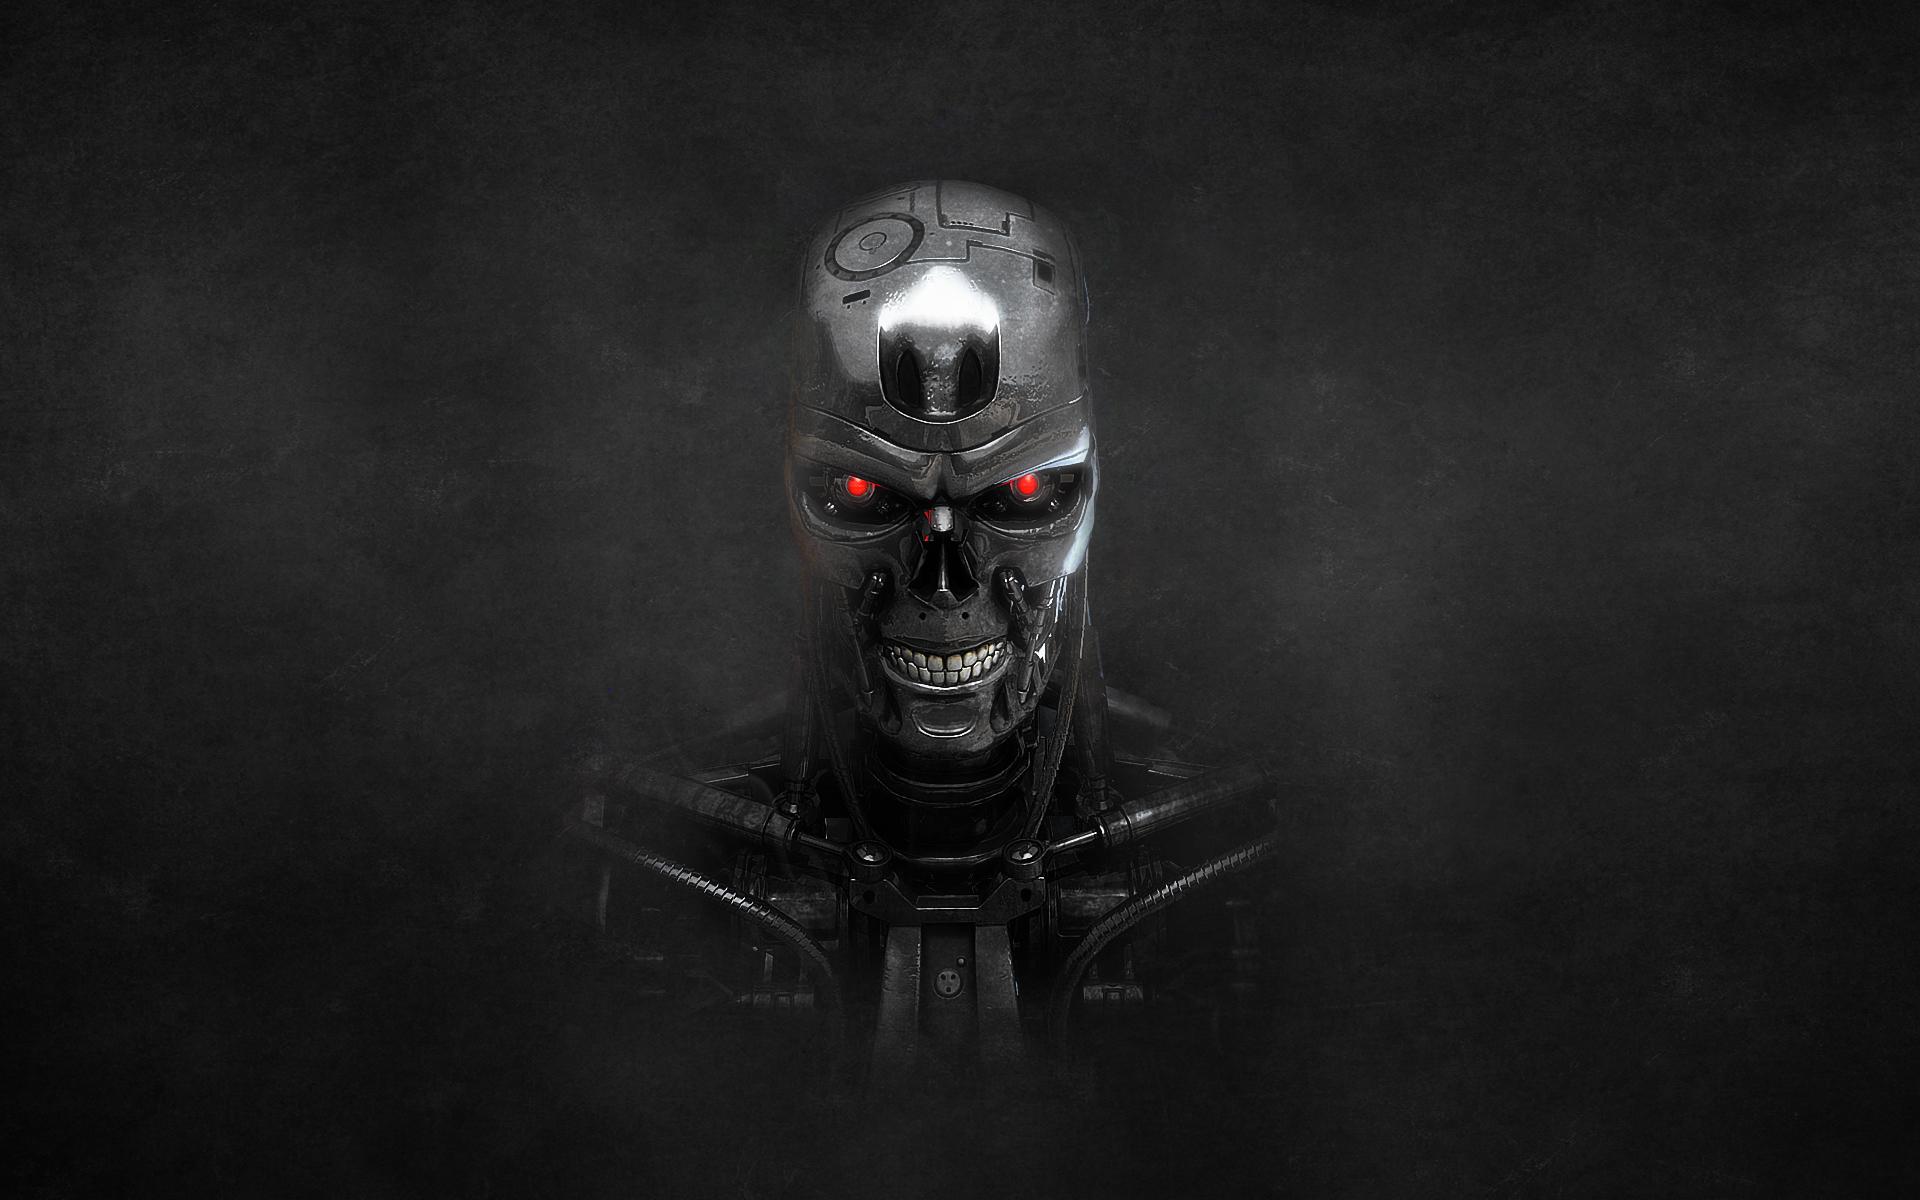 Wallpaper : digital art, Terminator, T 800, cyborg ...